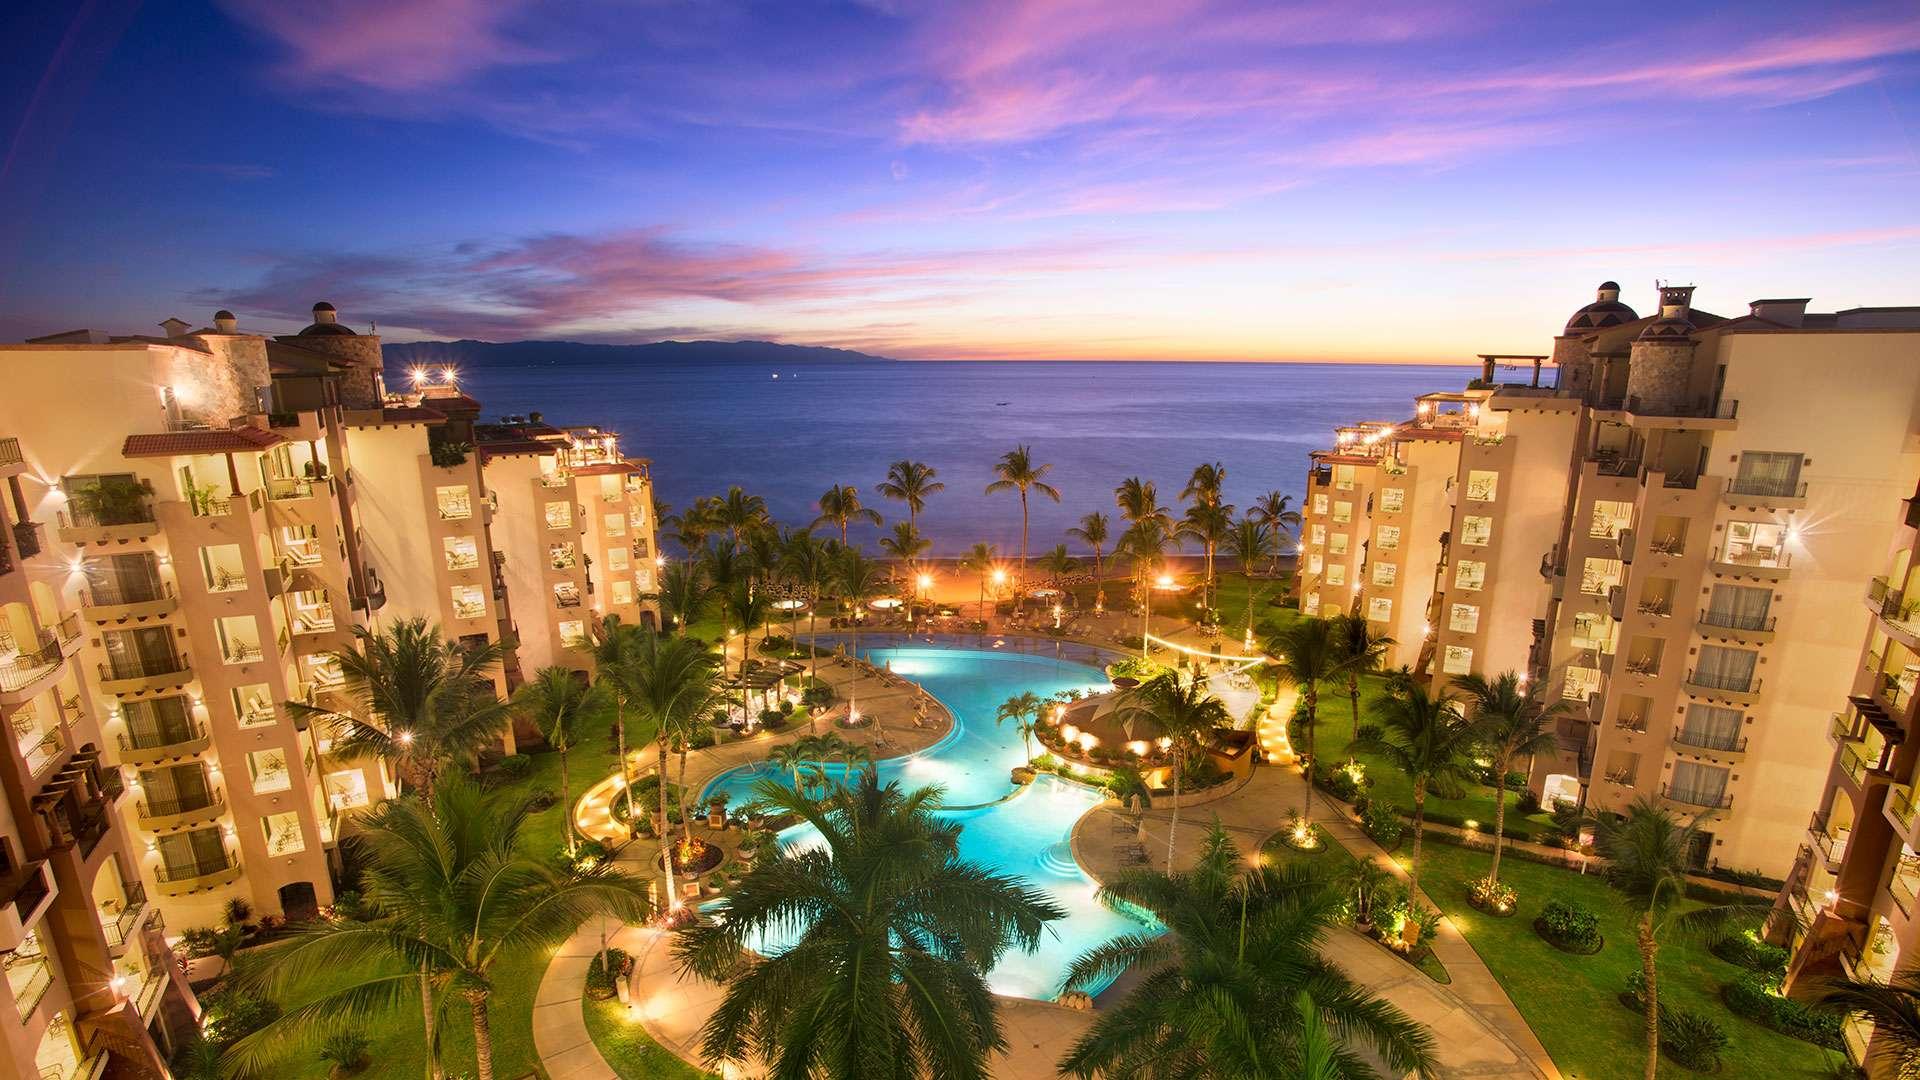 Villa La Estancia Riviera Nayarit Wins Tavellers Choice Awards By Tripadvisor